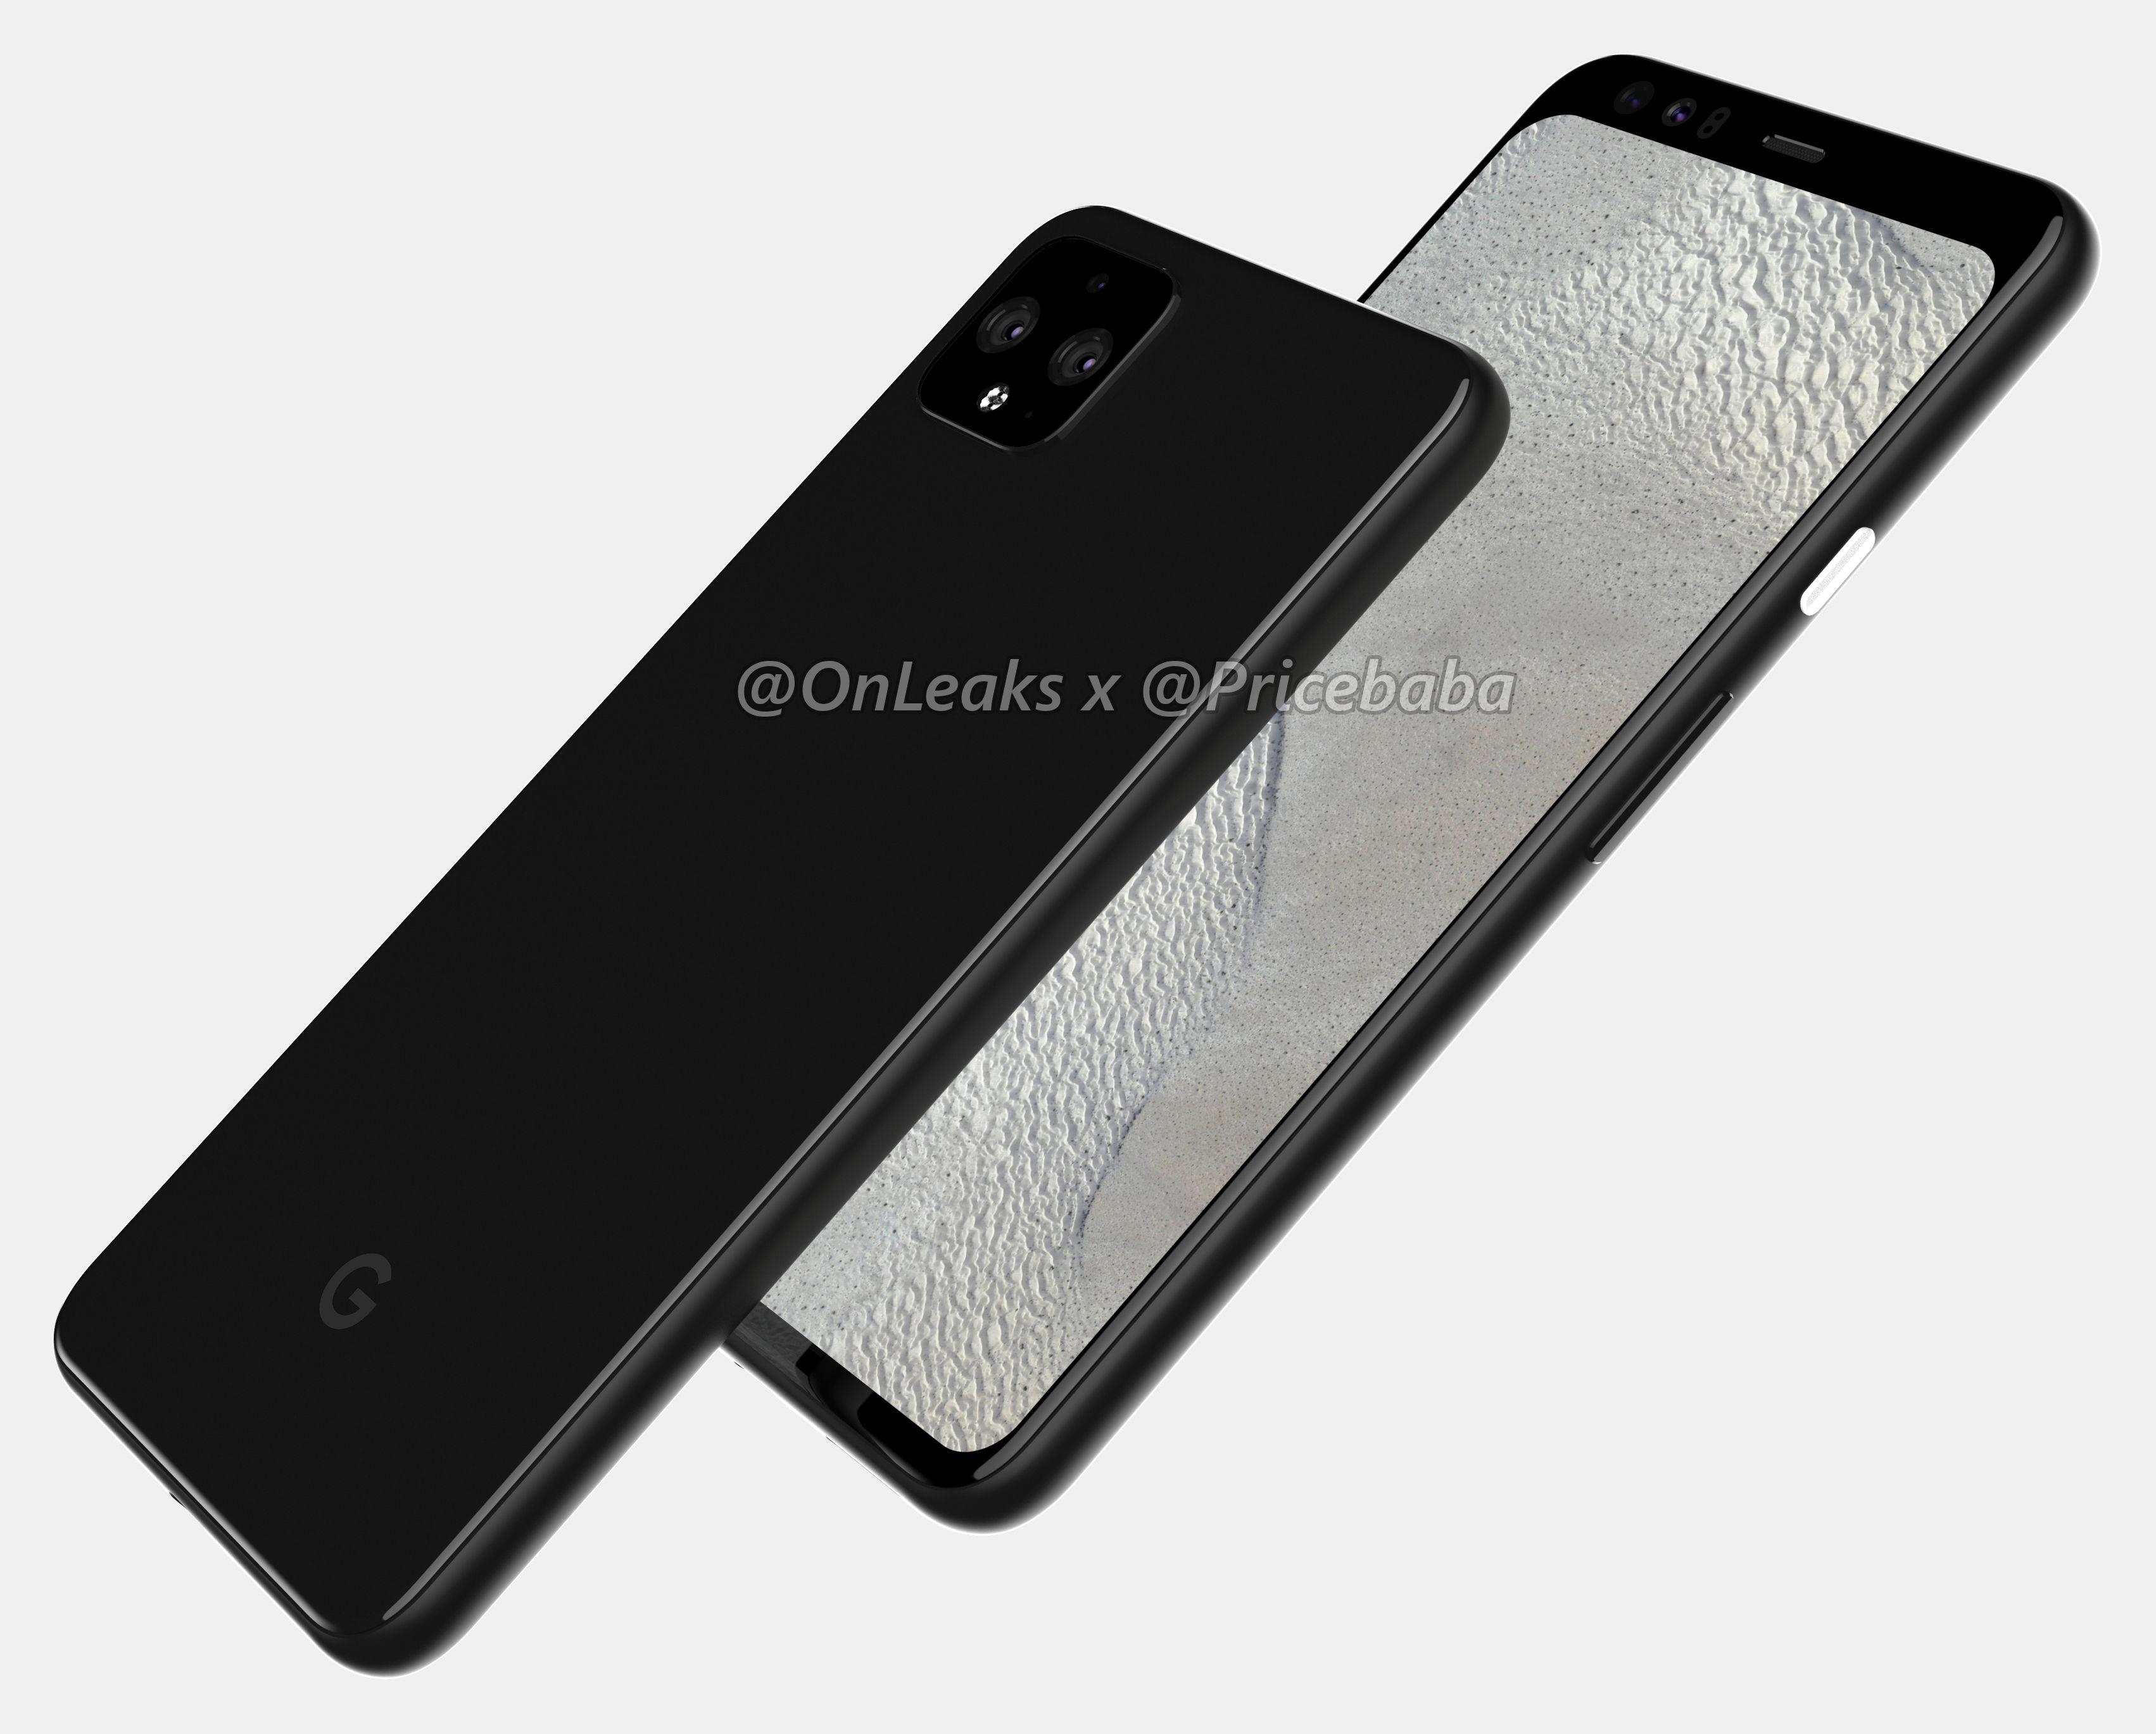 google pixel 4 xl renders suggest in